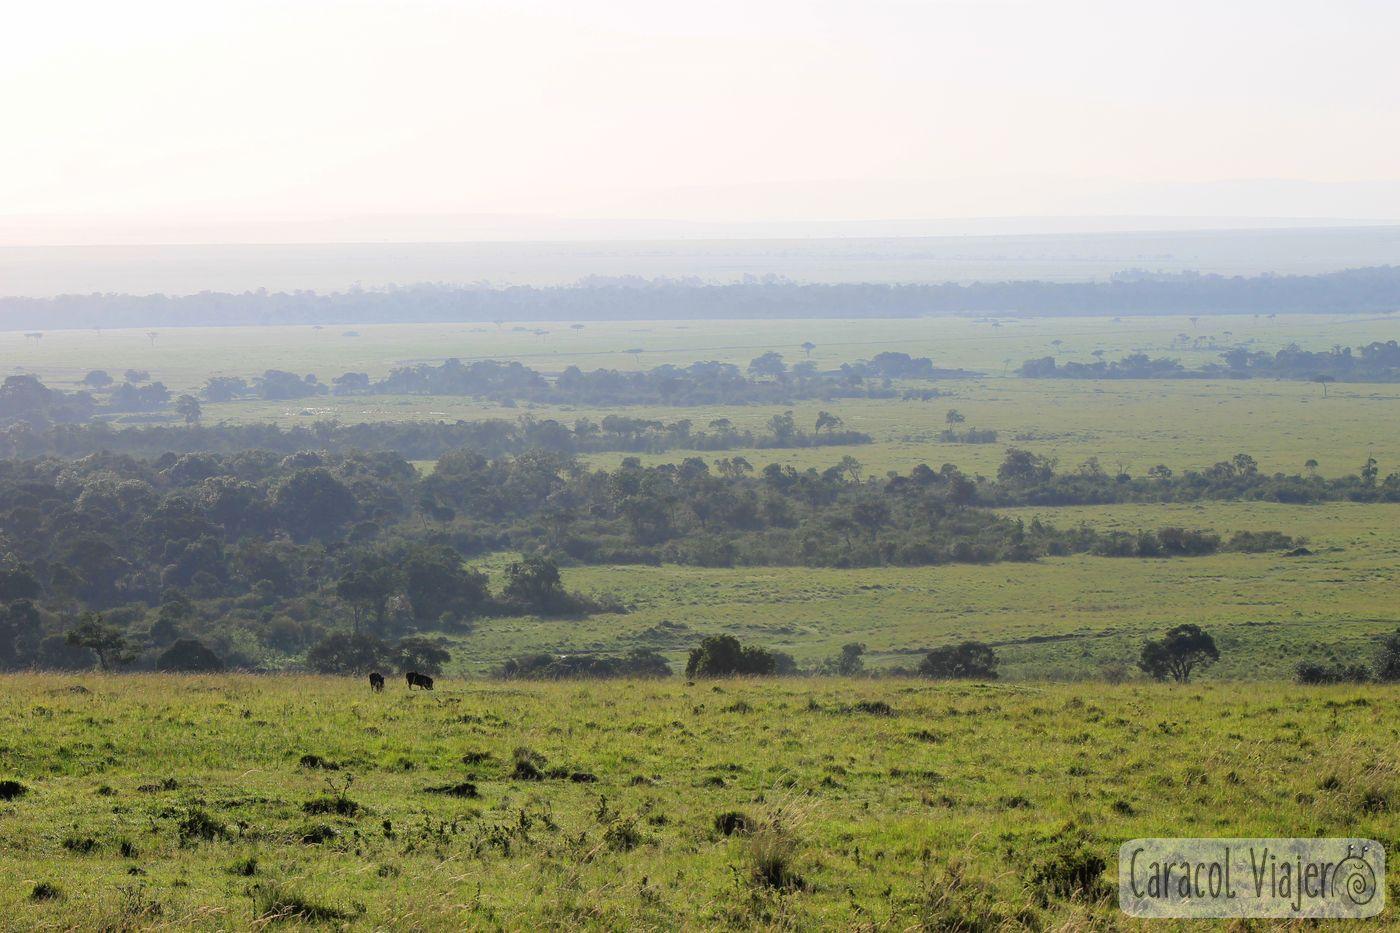 Africa, Kenia - Masai Mara